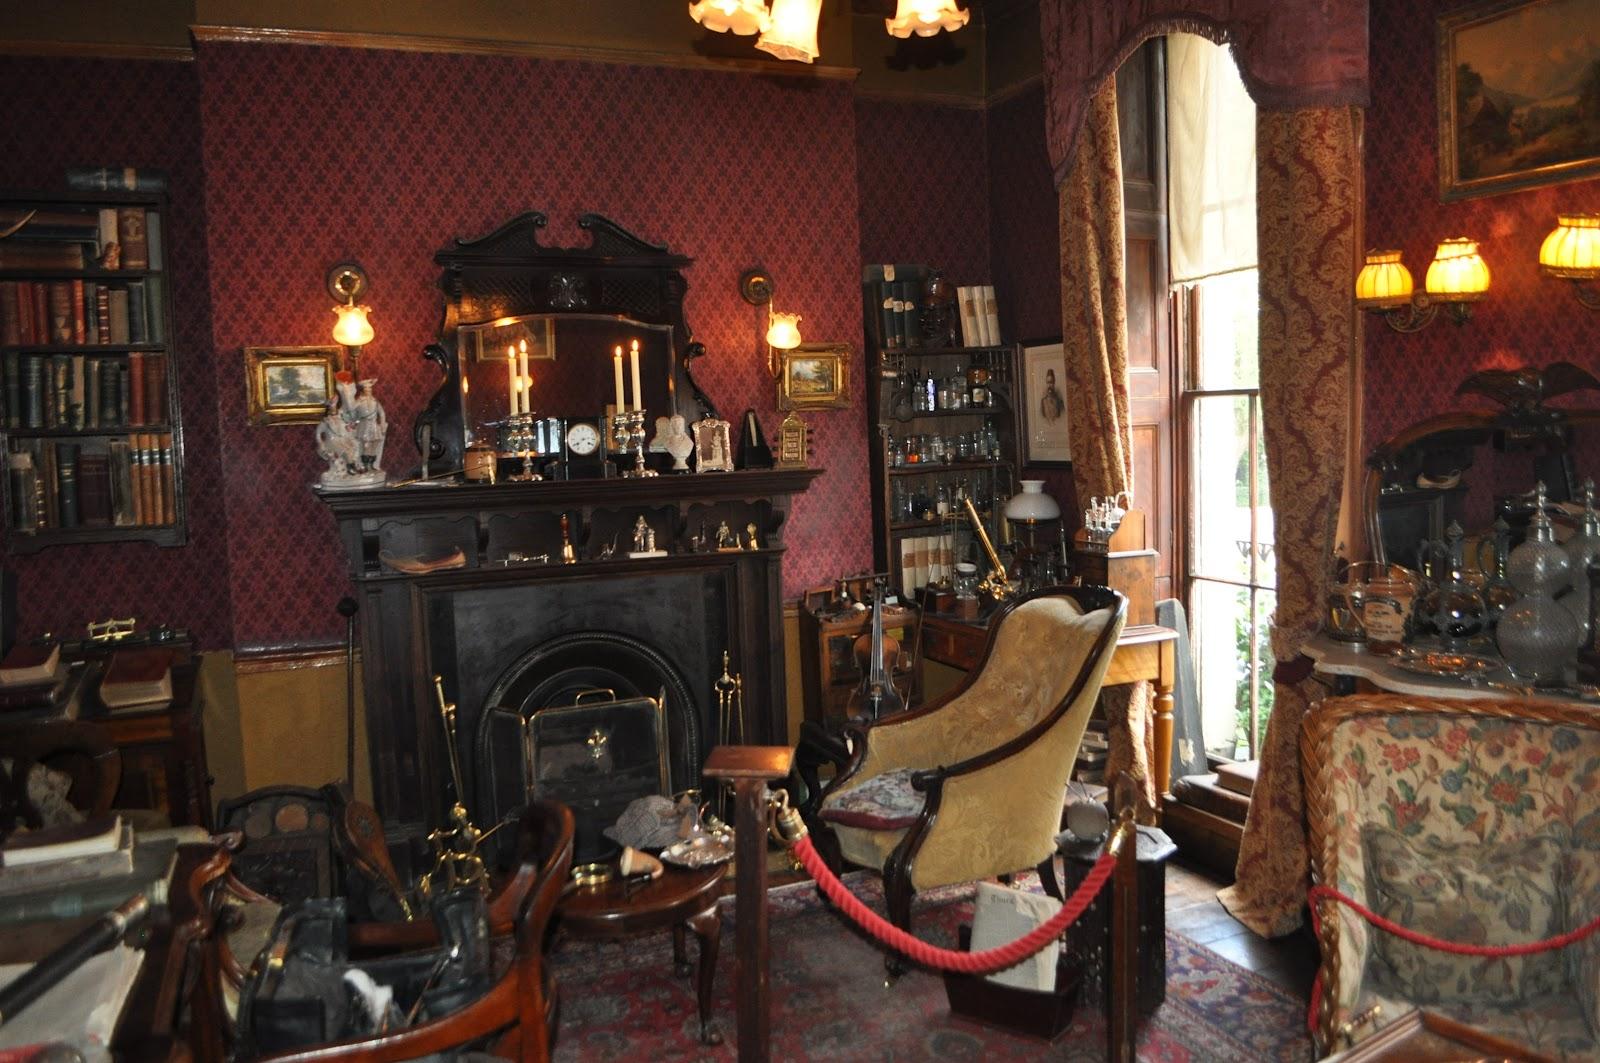 Raquel ritz viajes museo de sherlock holmes londres uk - Casa de sherlock holmes ...